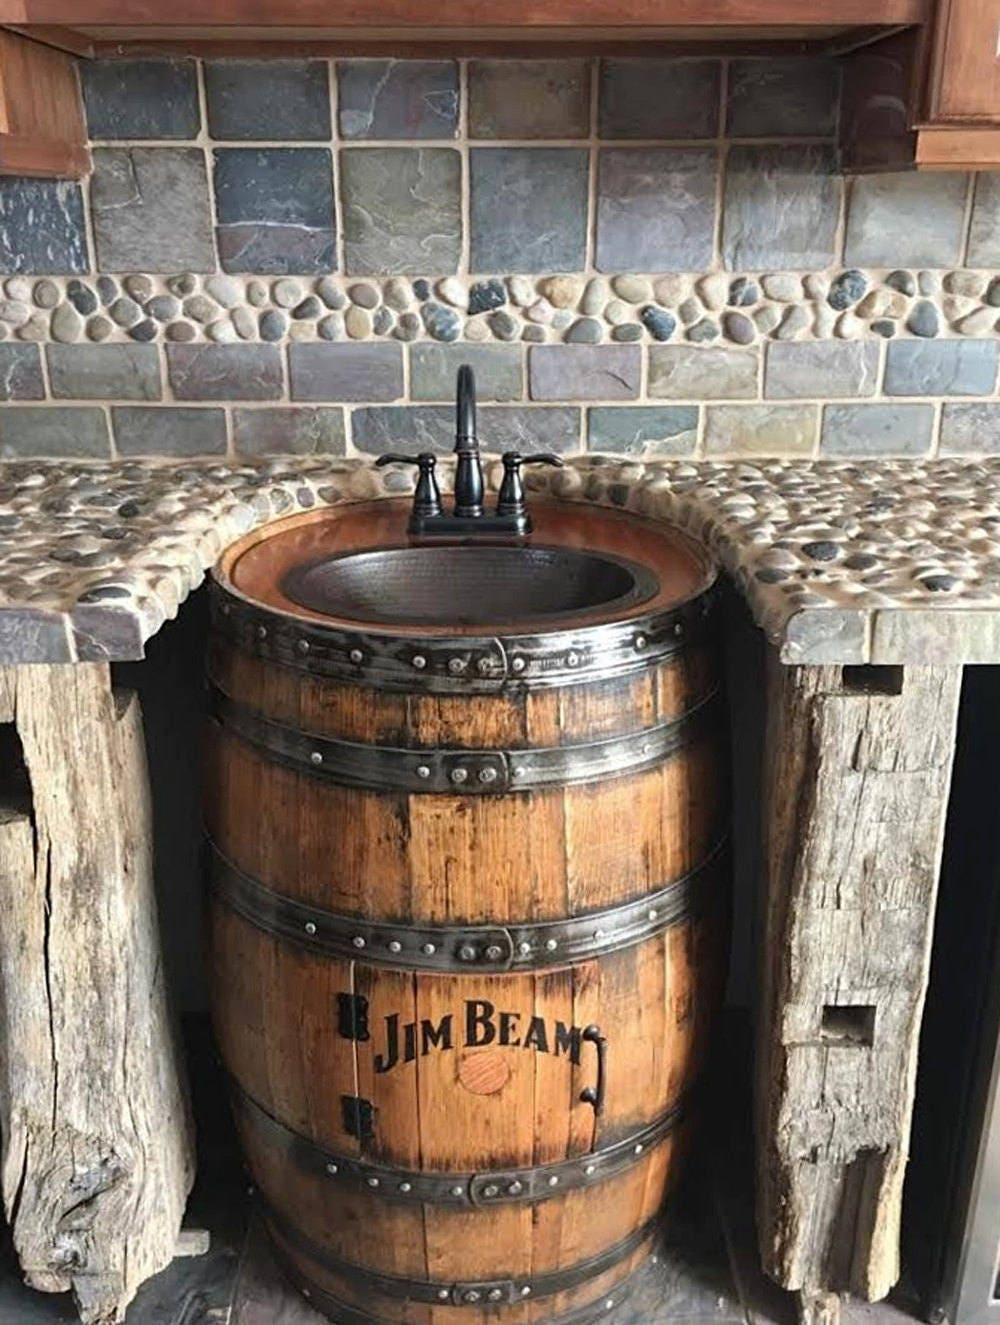 Whiskey Barrel Sink Hammered Copper Rustic Antique